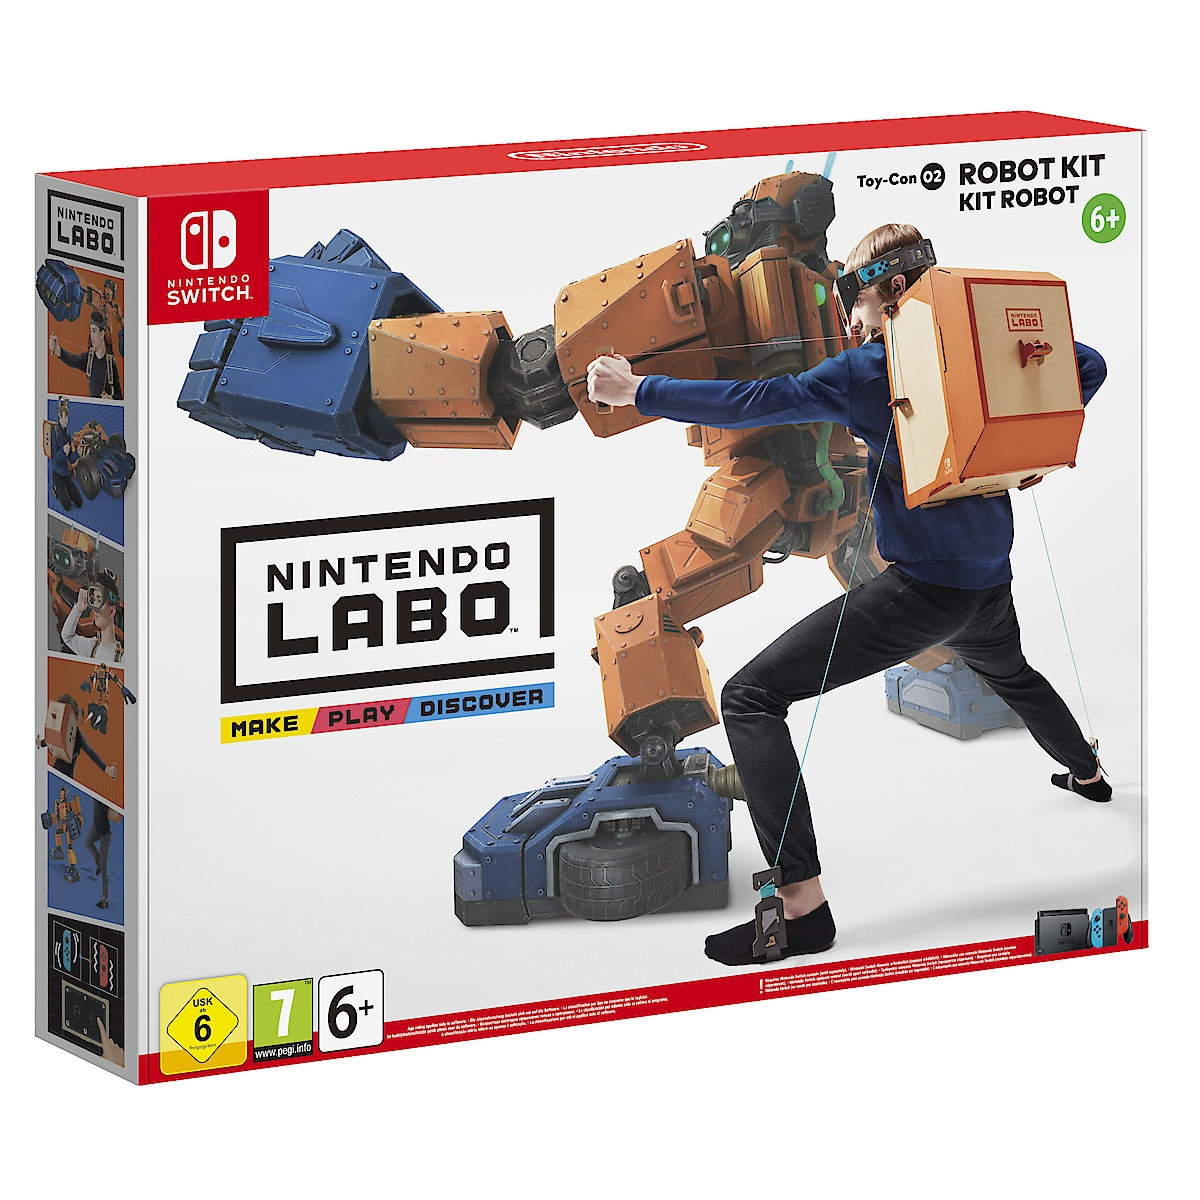 Toy-Con 02: Robot Kit Nintendo Labo spel till Nintendo Switch